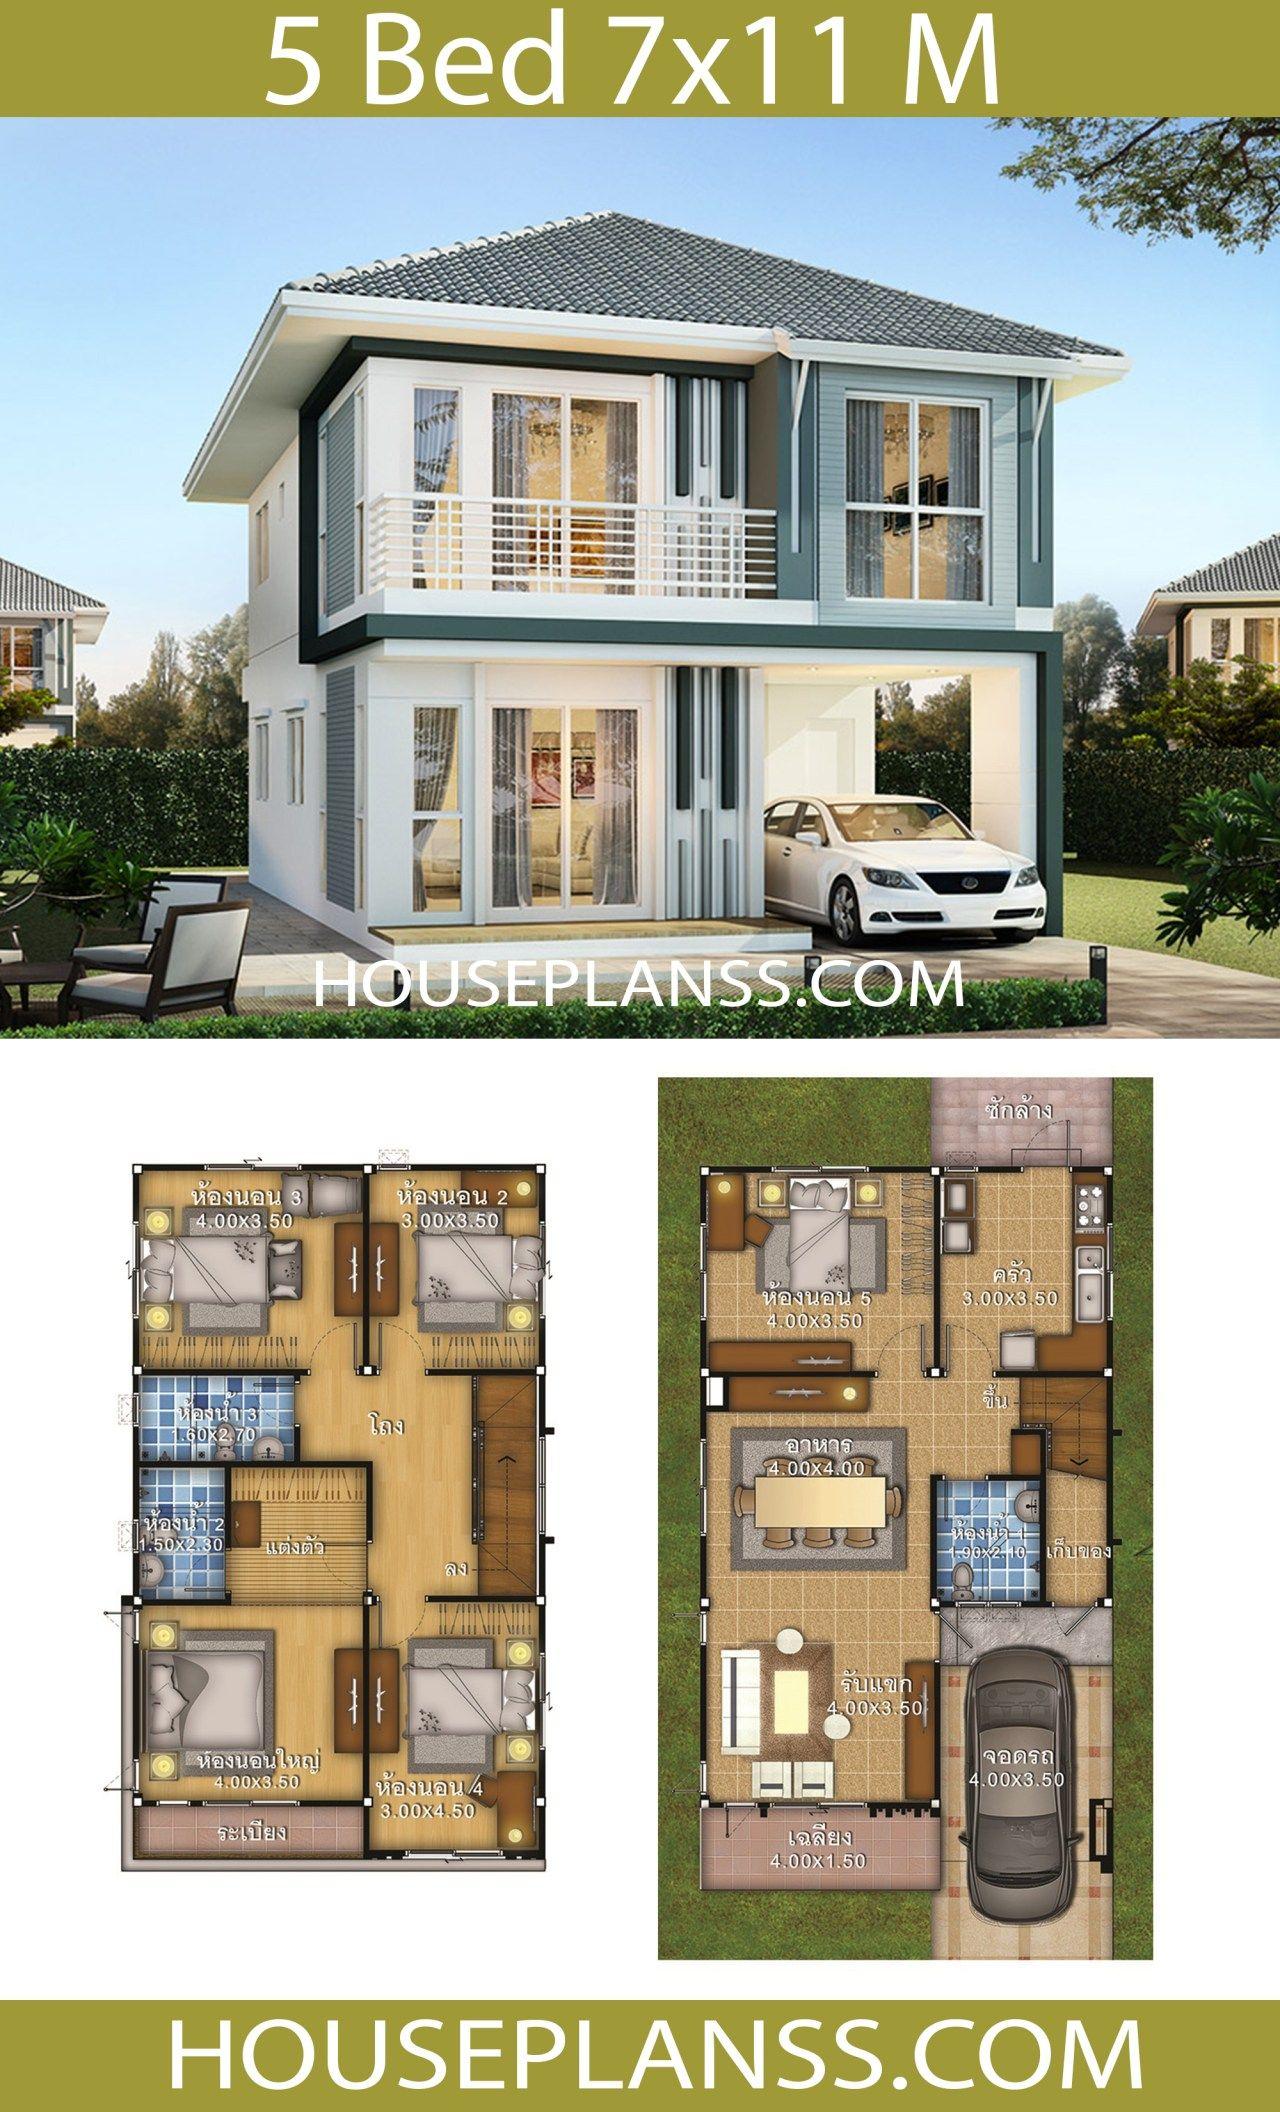 House Design Plans Idea 7x11 With 5 Bedrooms Home Ideas House Layout Plans Model House Plan 5 Bedroom House Plans